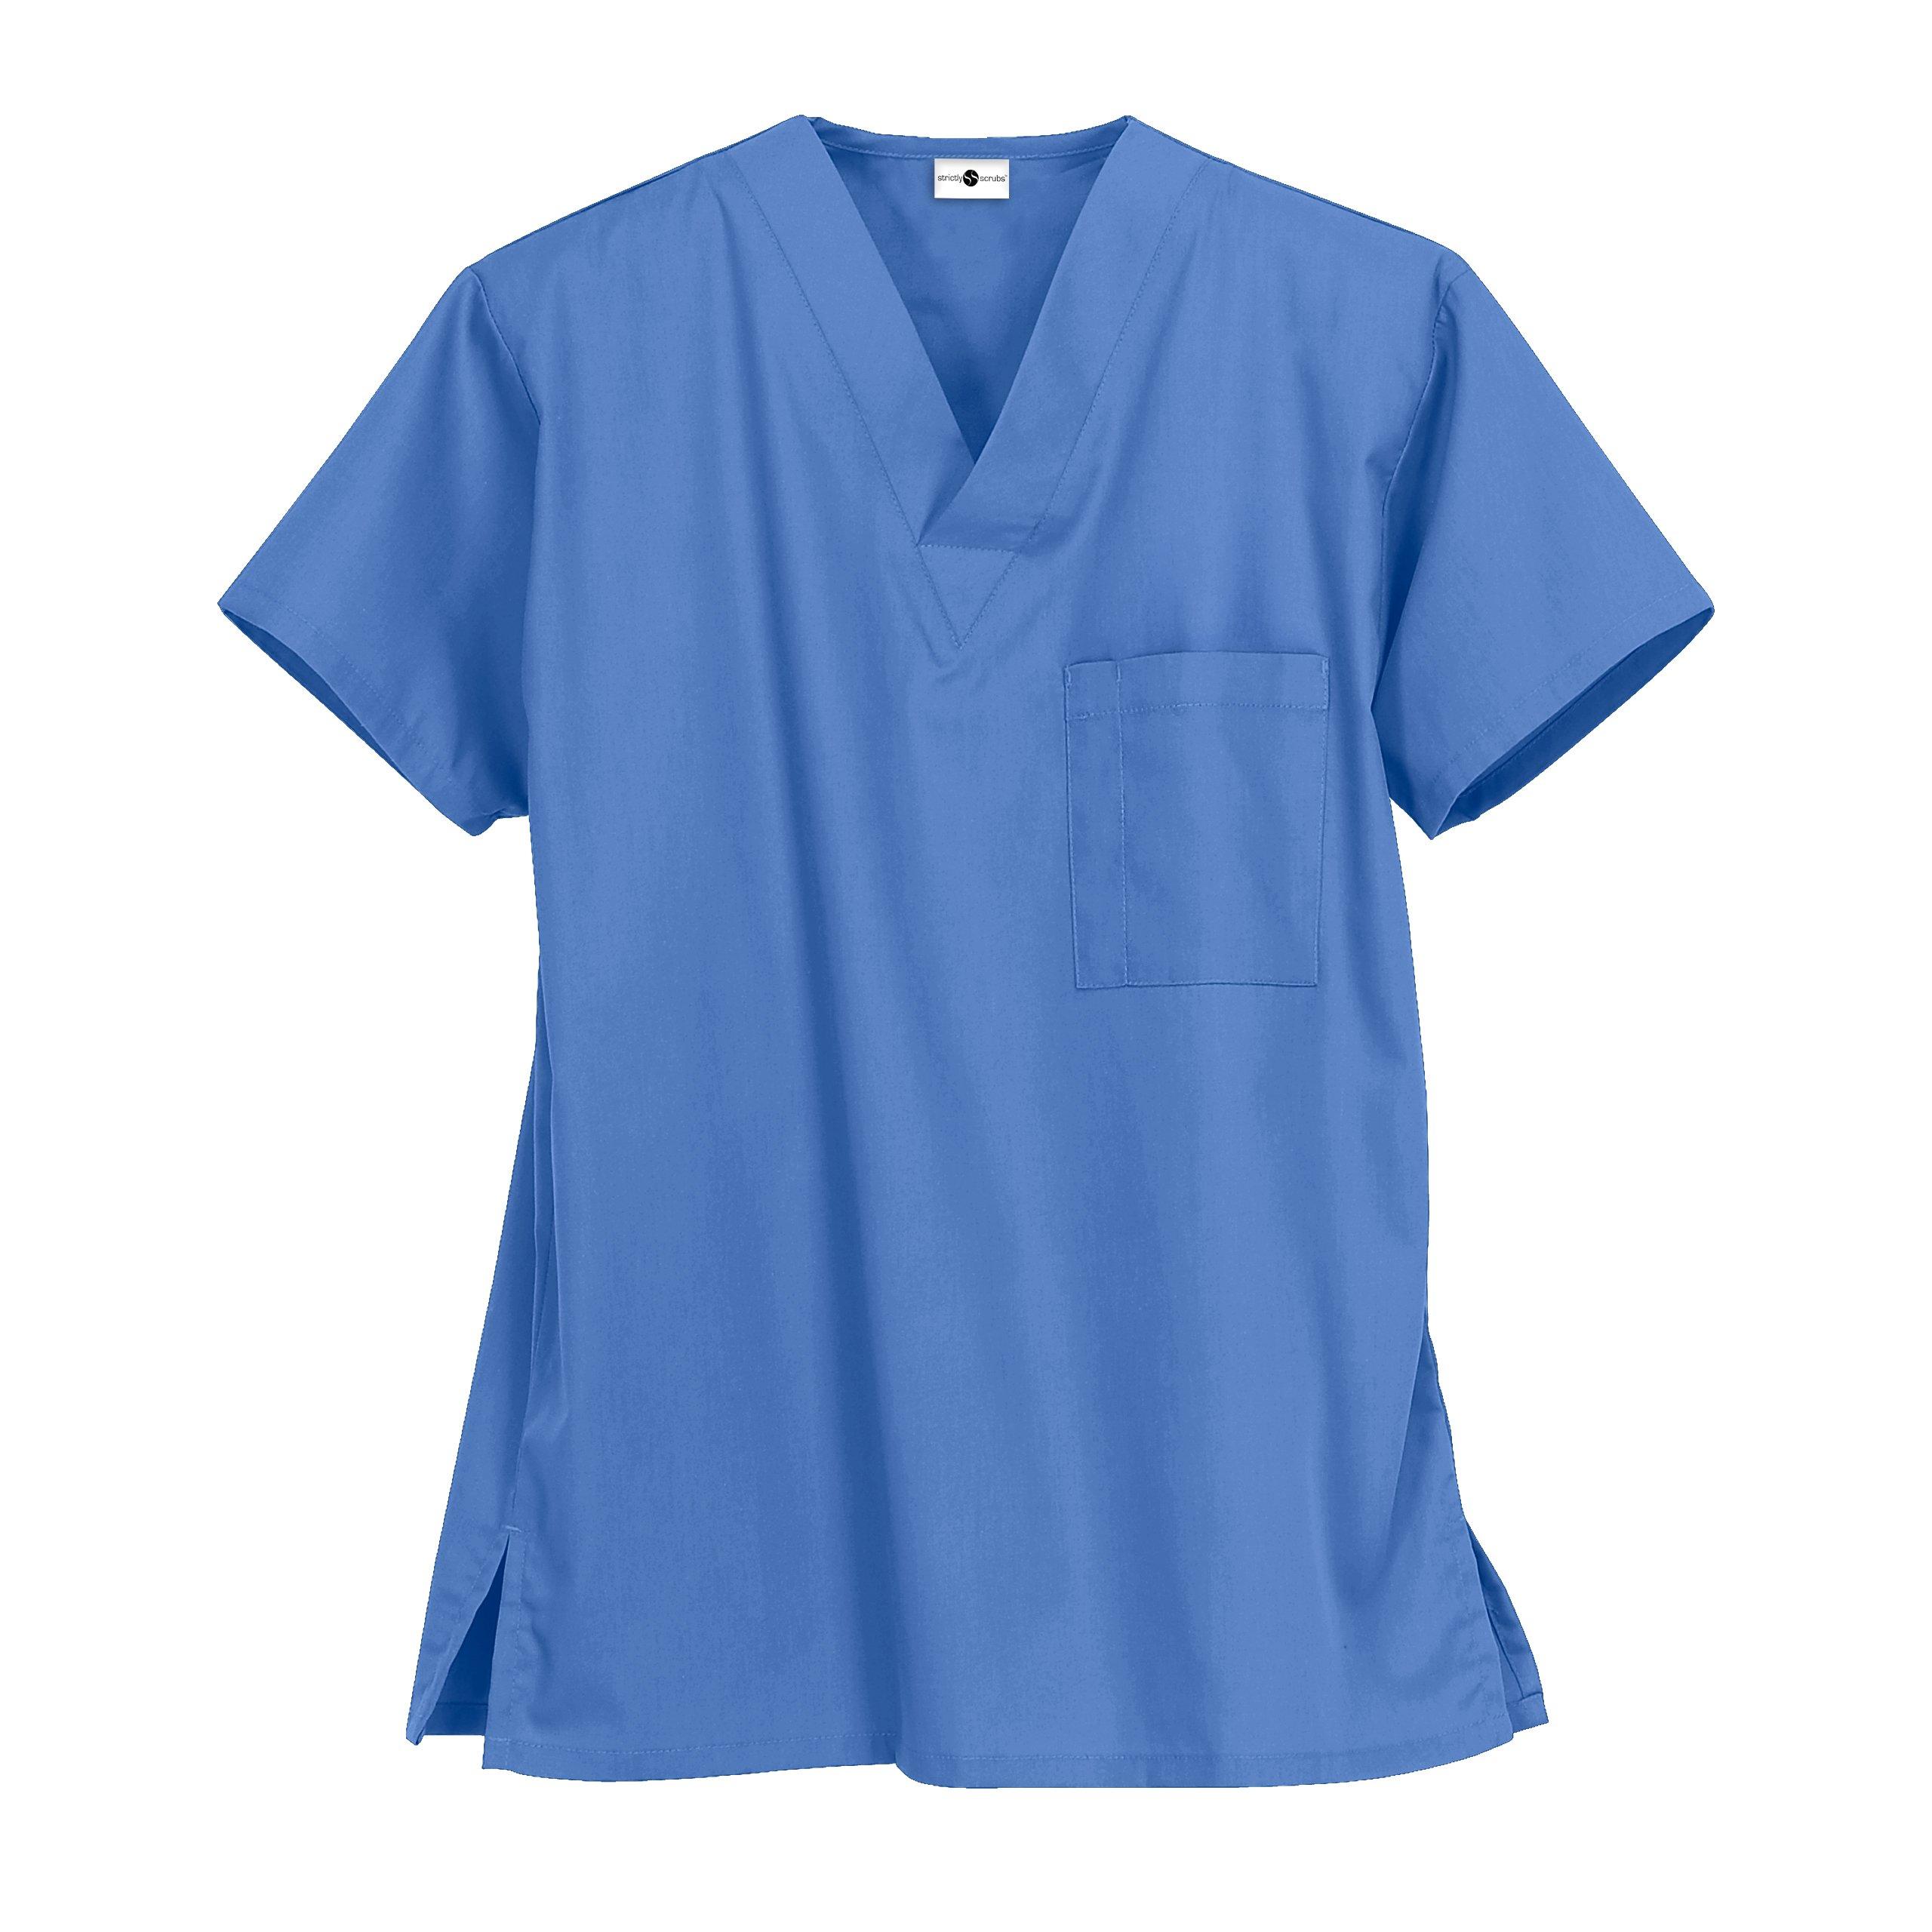 Strictly Scrubs Unisex Medical Uniform Set (Medium, Ceil) by Strictly Scrubs (Image #2)